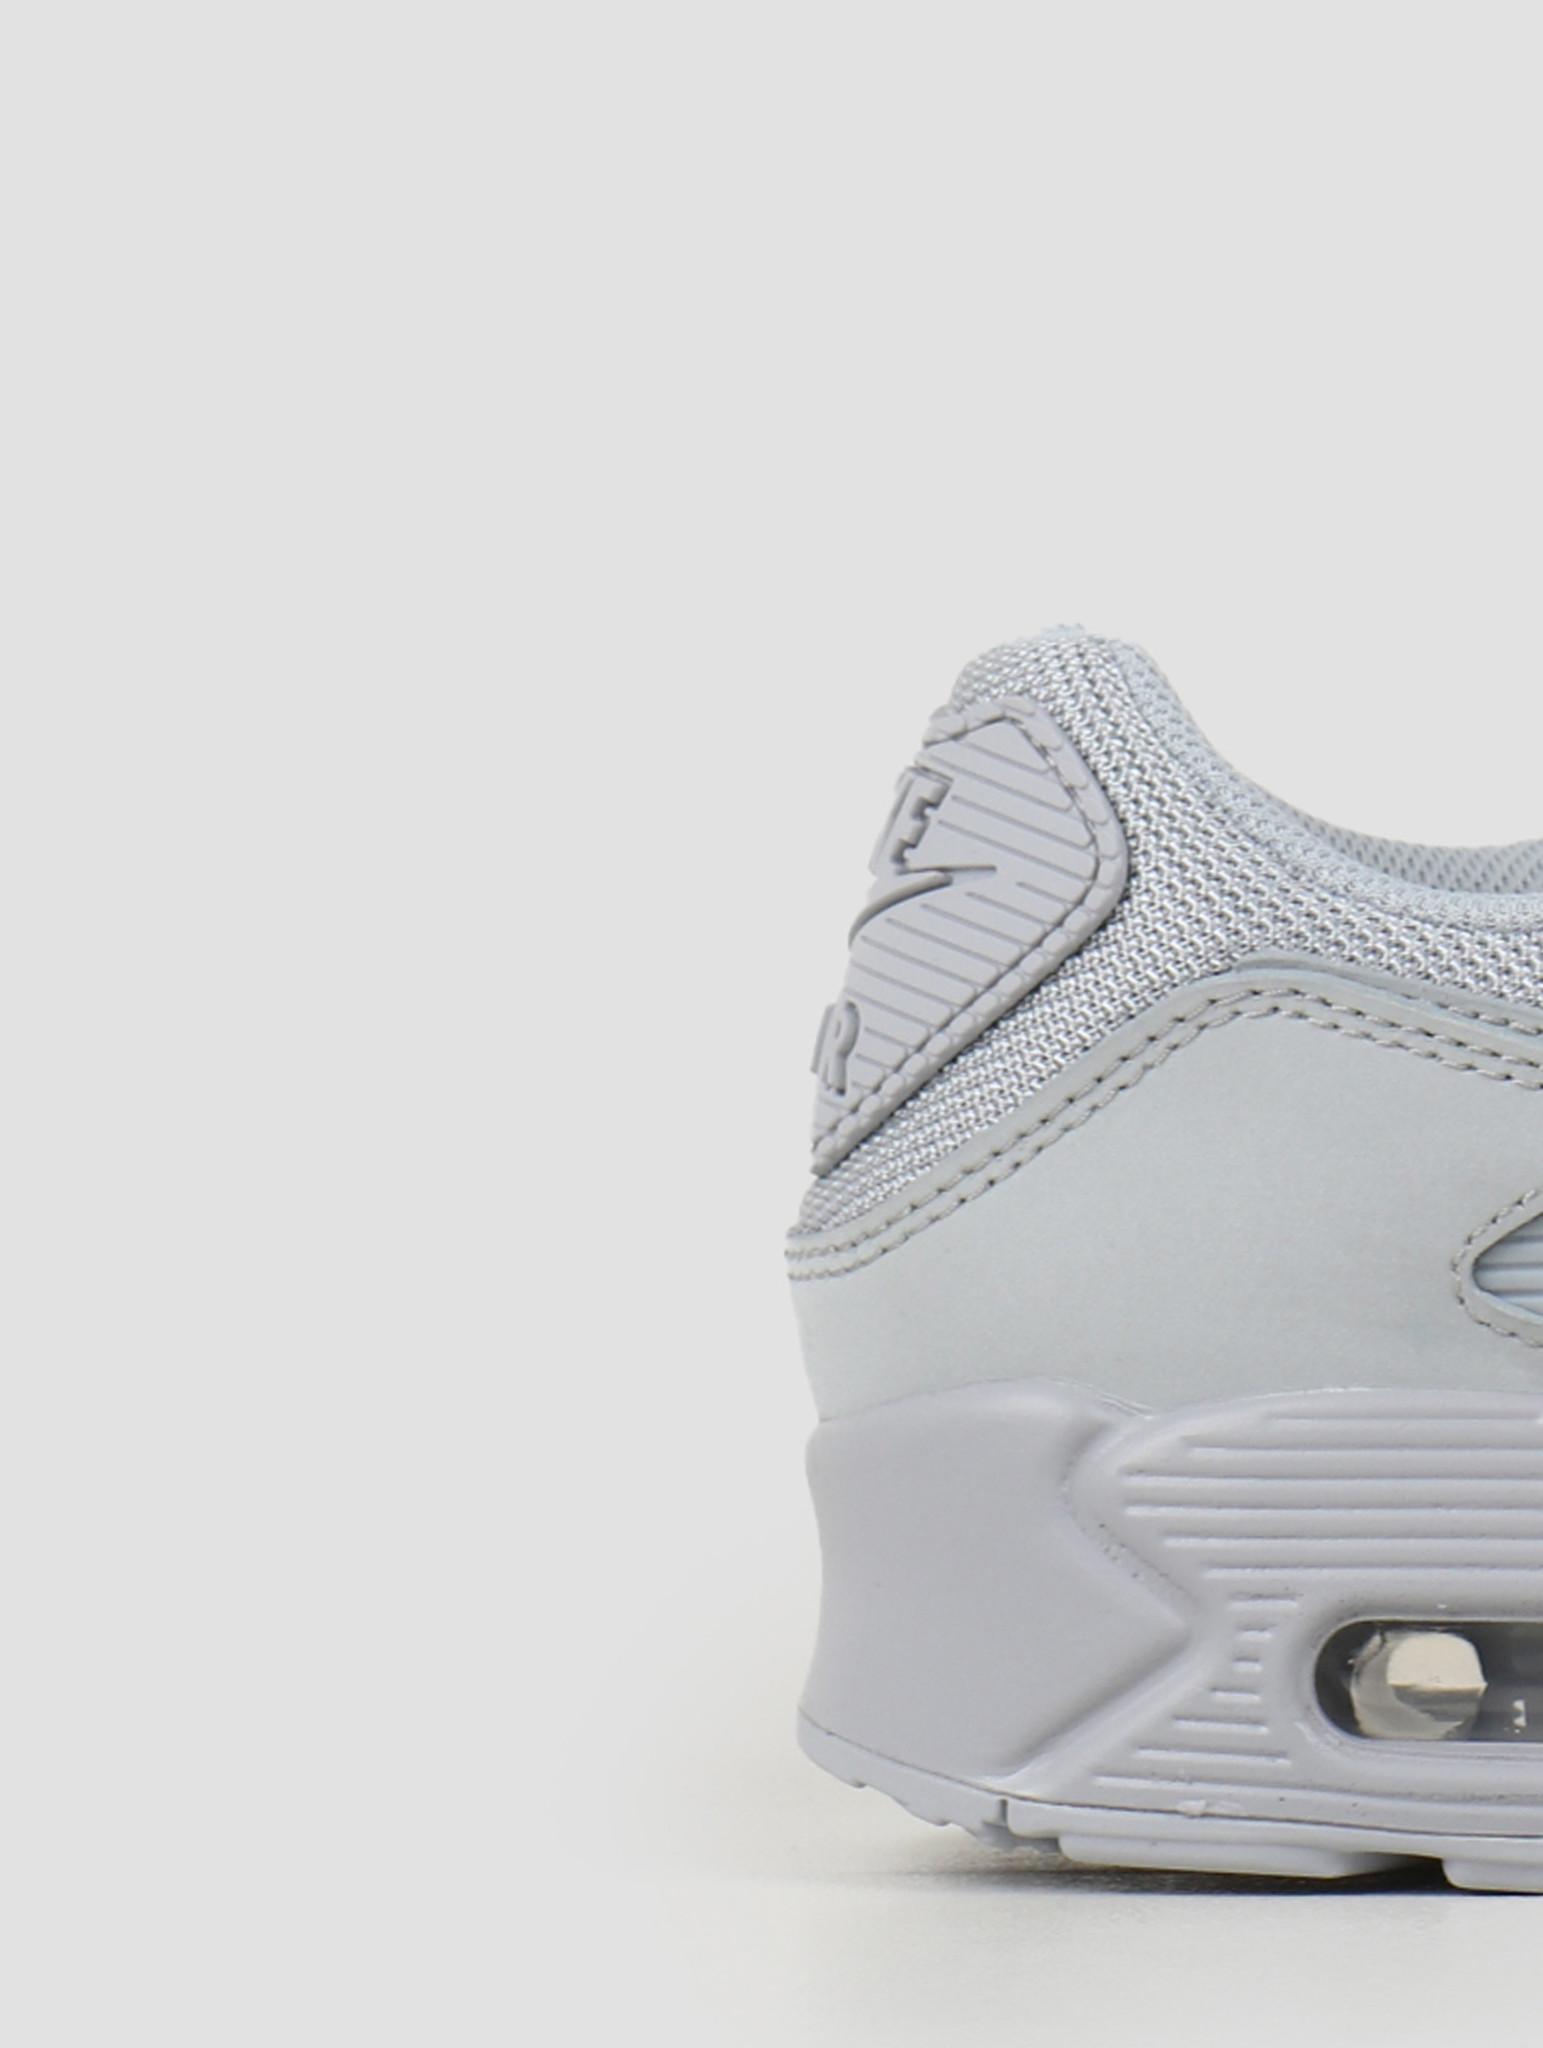 Nike Nike Air Max 90 Wolf Grey Wolf Grey-Wolf Grey-Black CN8490-001